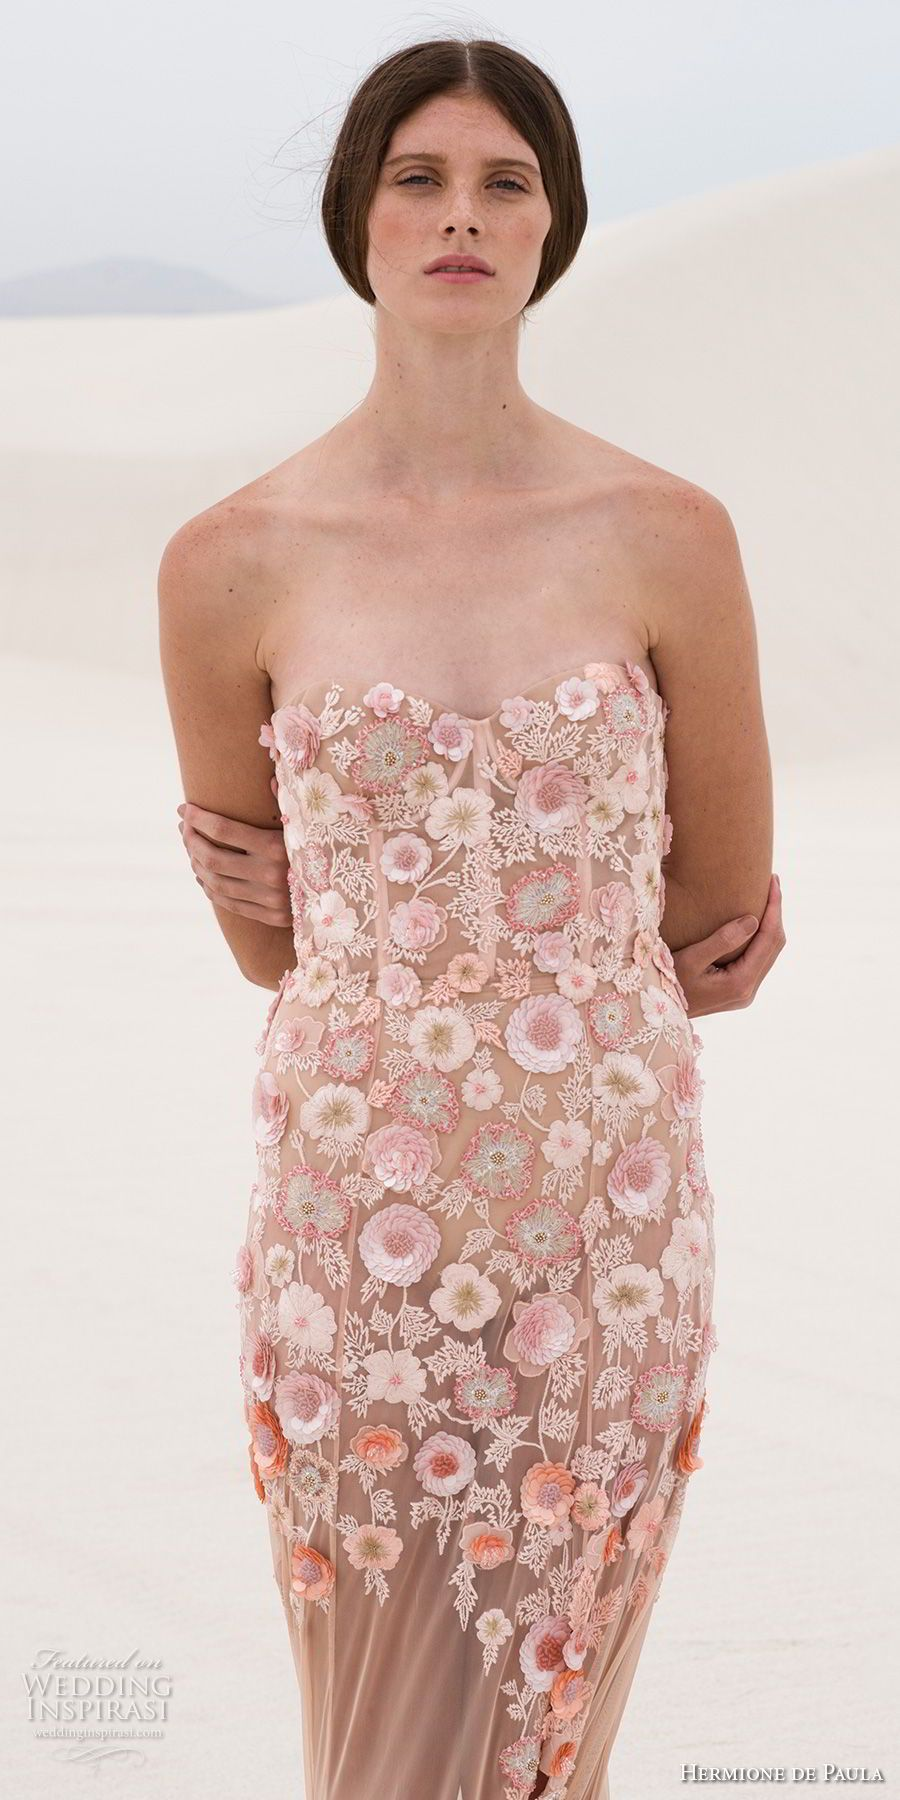 Hermione De Paula Frühling 2019 Braut Trägerlosen Schatz Ausschnitt Stark  Verzierten Mieder Romantischen Nude Farbe Mantel